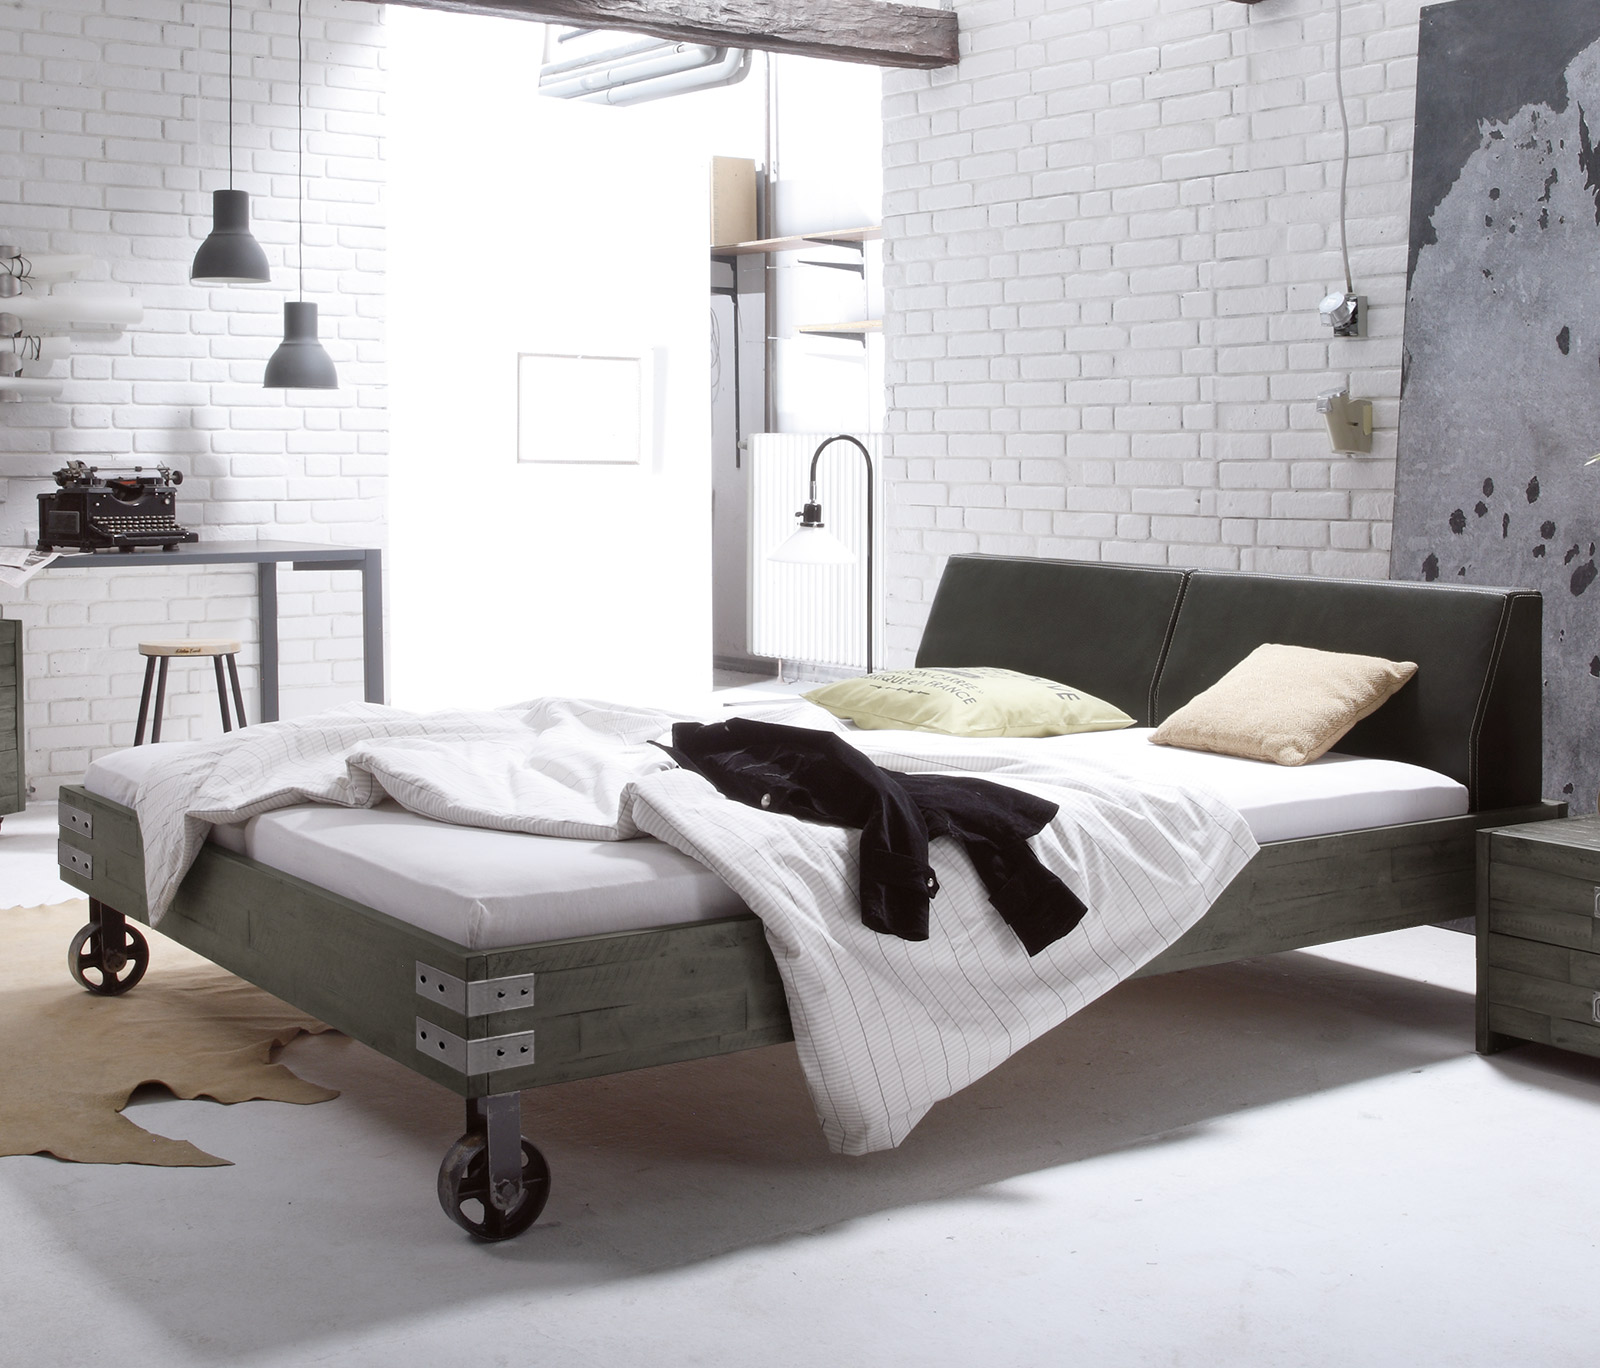 Full Size of Massivholzbett Mit Rollen Im Industrial Design Tornio Bett Betten.de